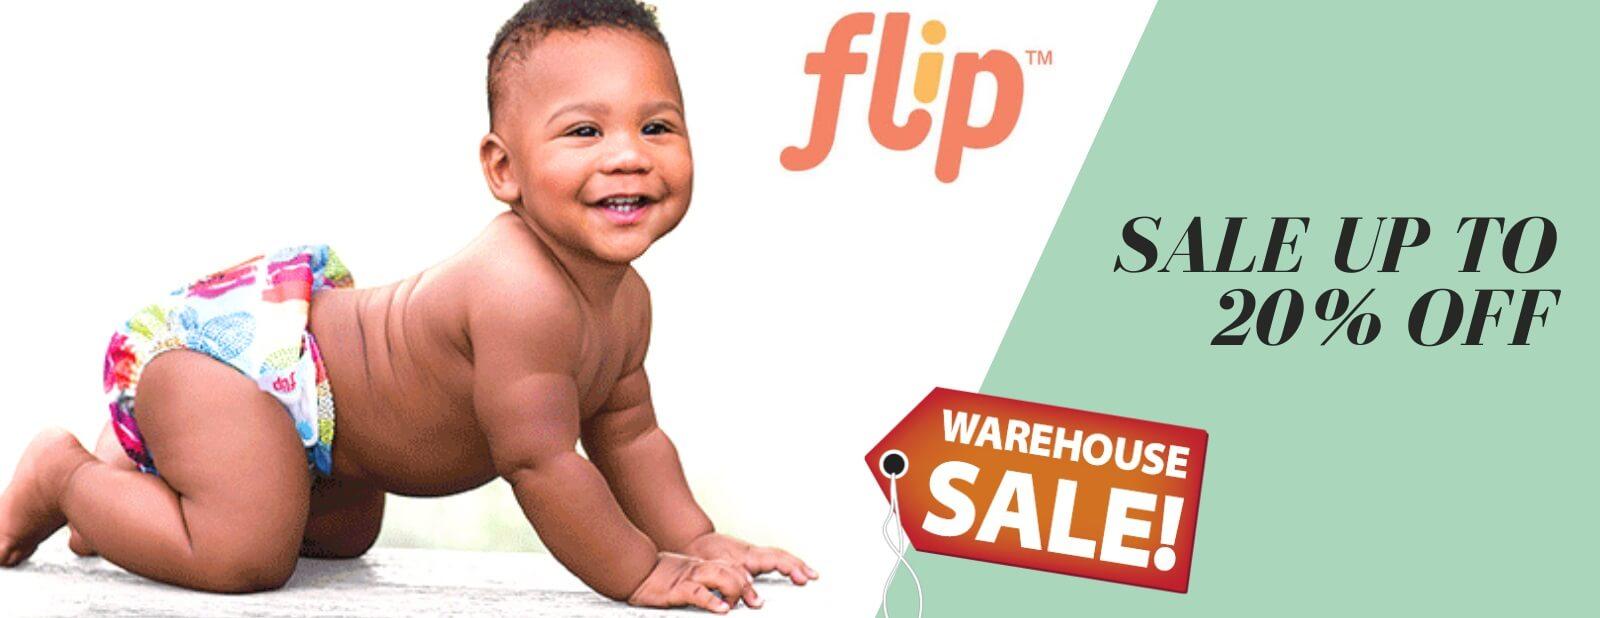 flip cloth diapers warehouse sale